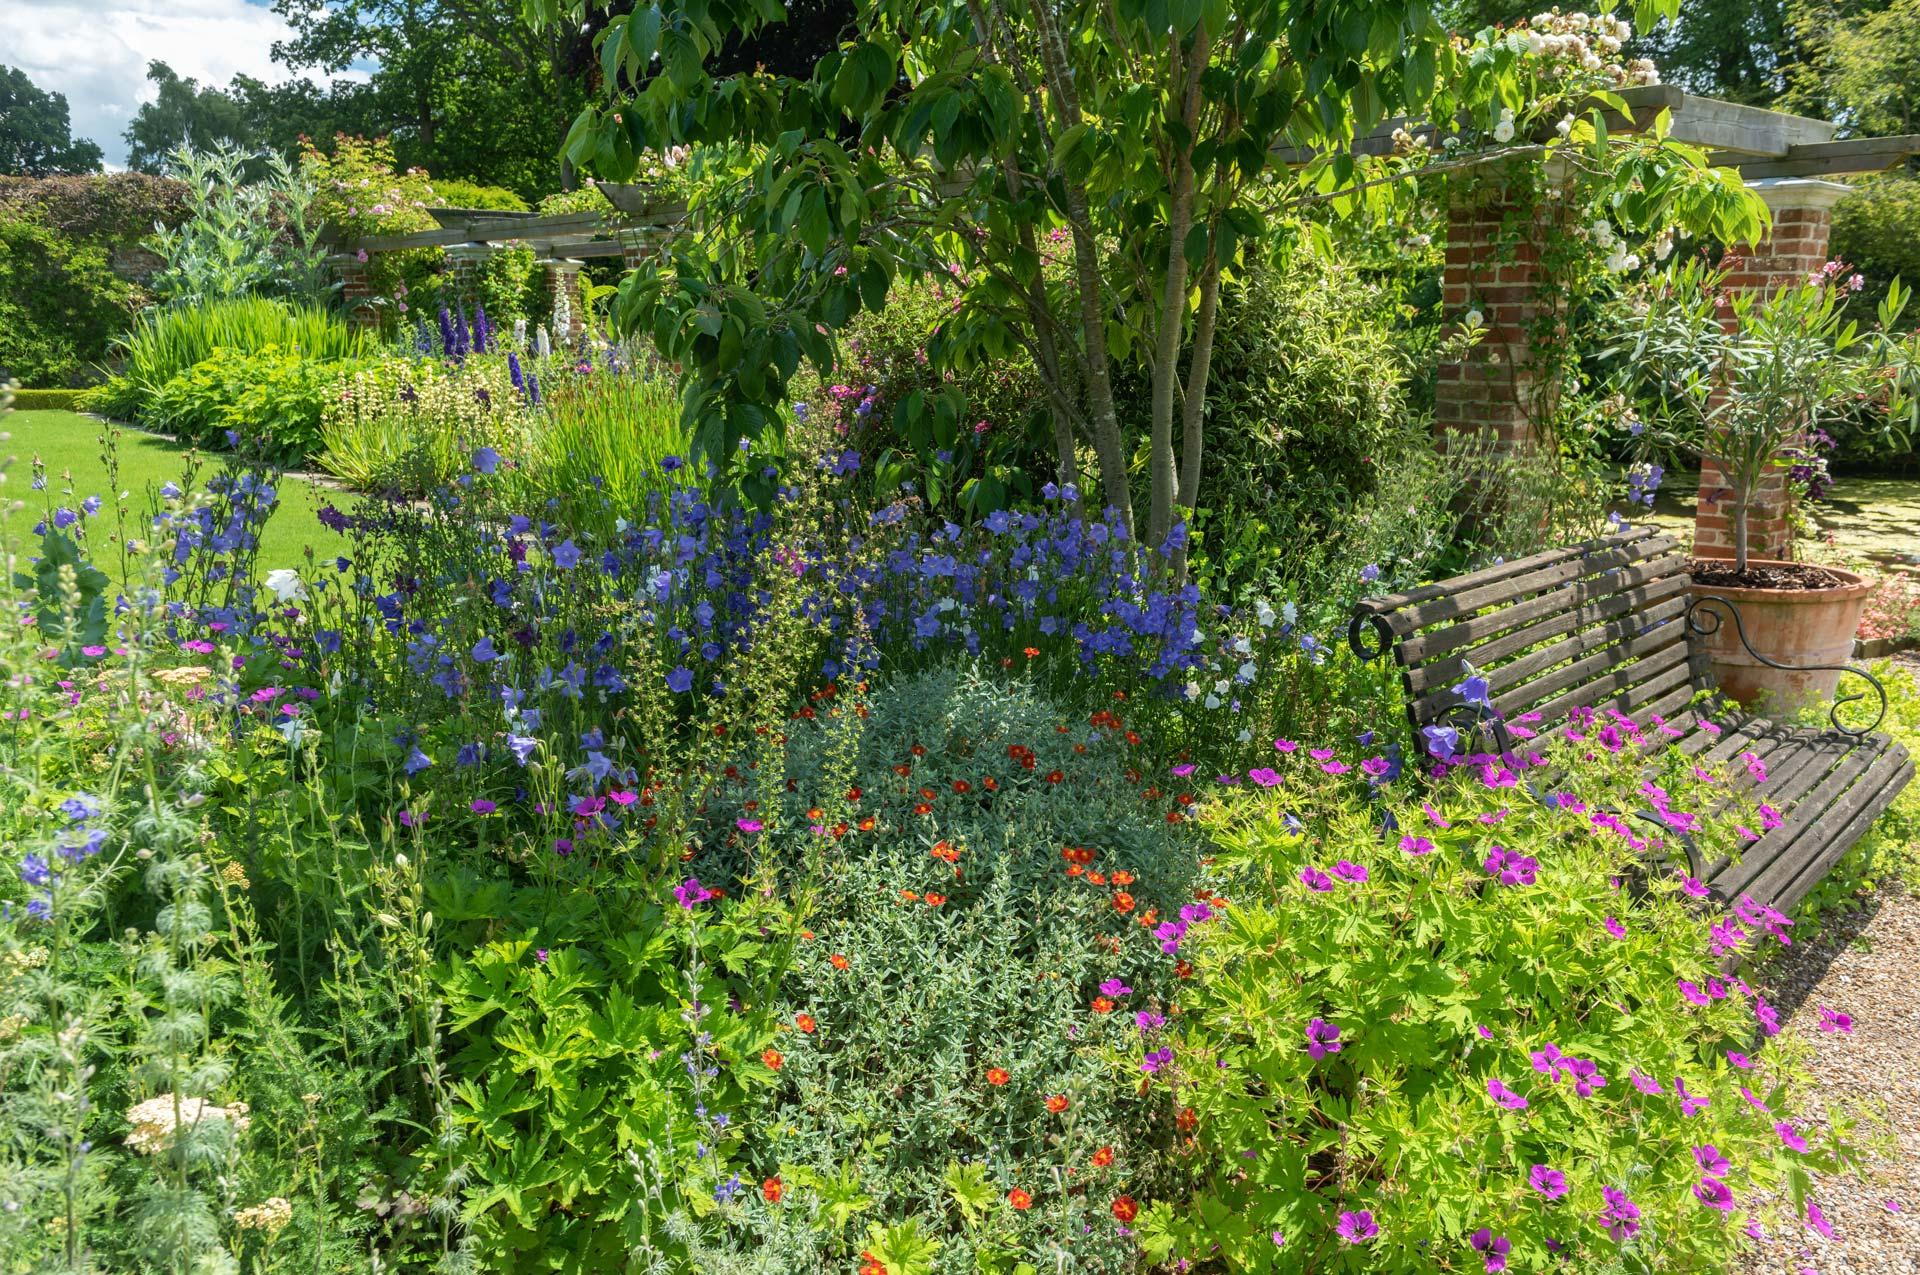 Hindringham Hall Gardens